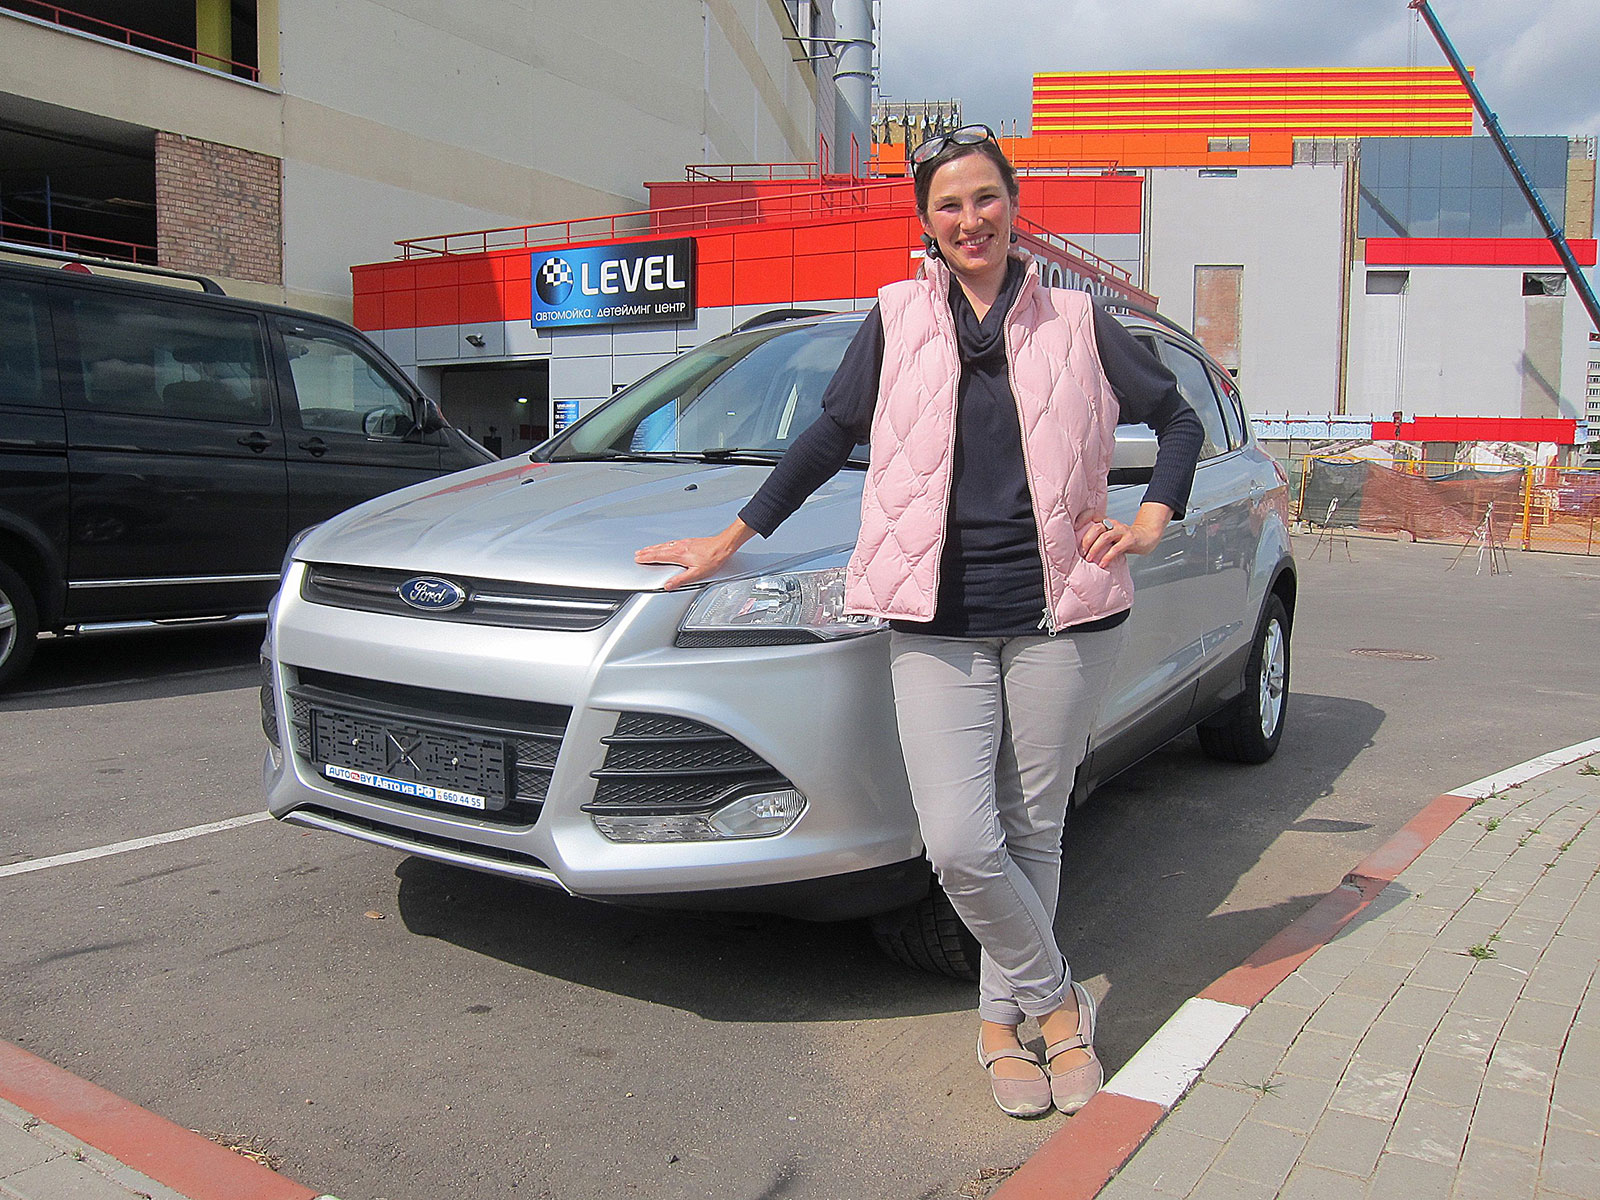 2015 Ford Kuga 1.6 EcoBoost с пробегом для Алены